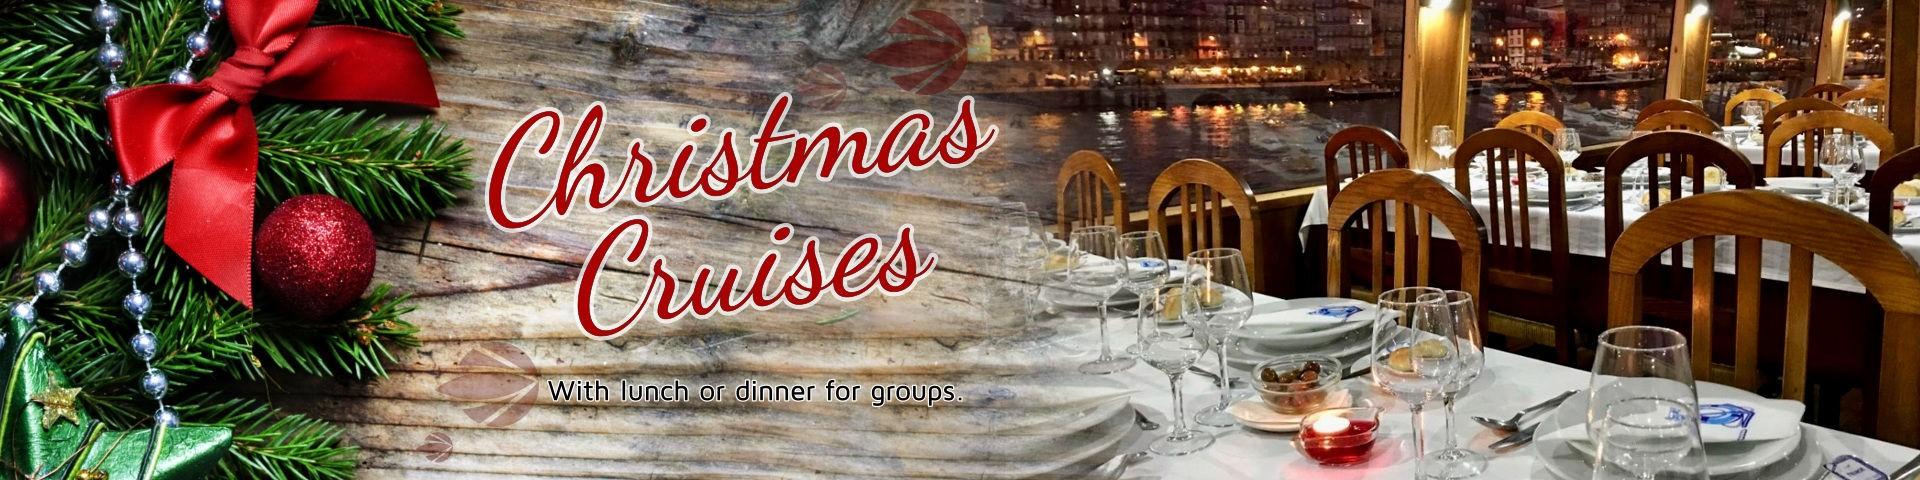 Christmas Cruises for groups